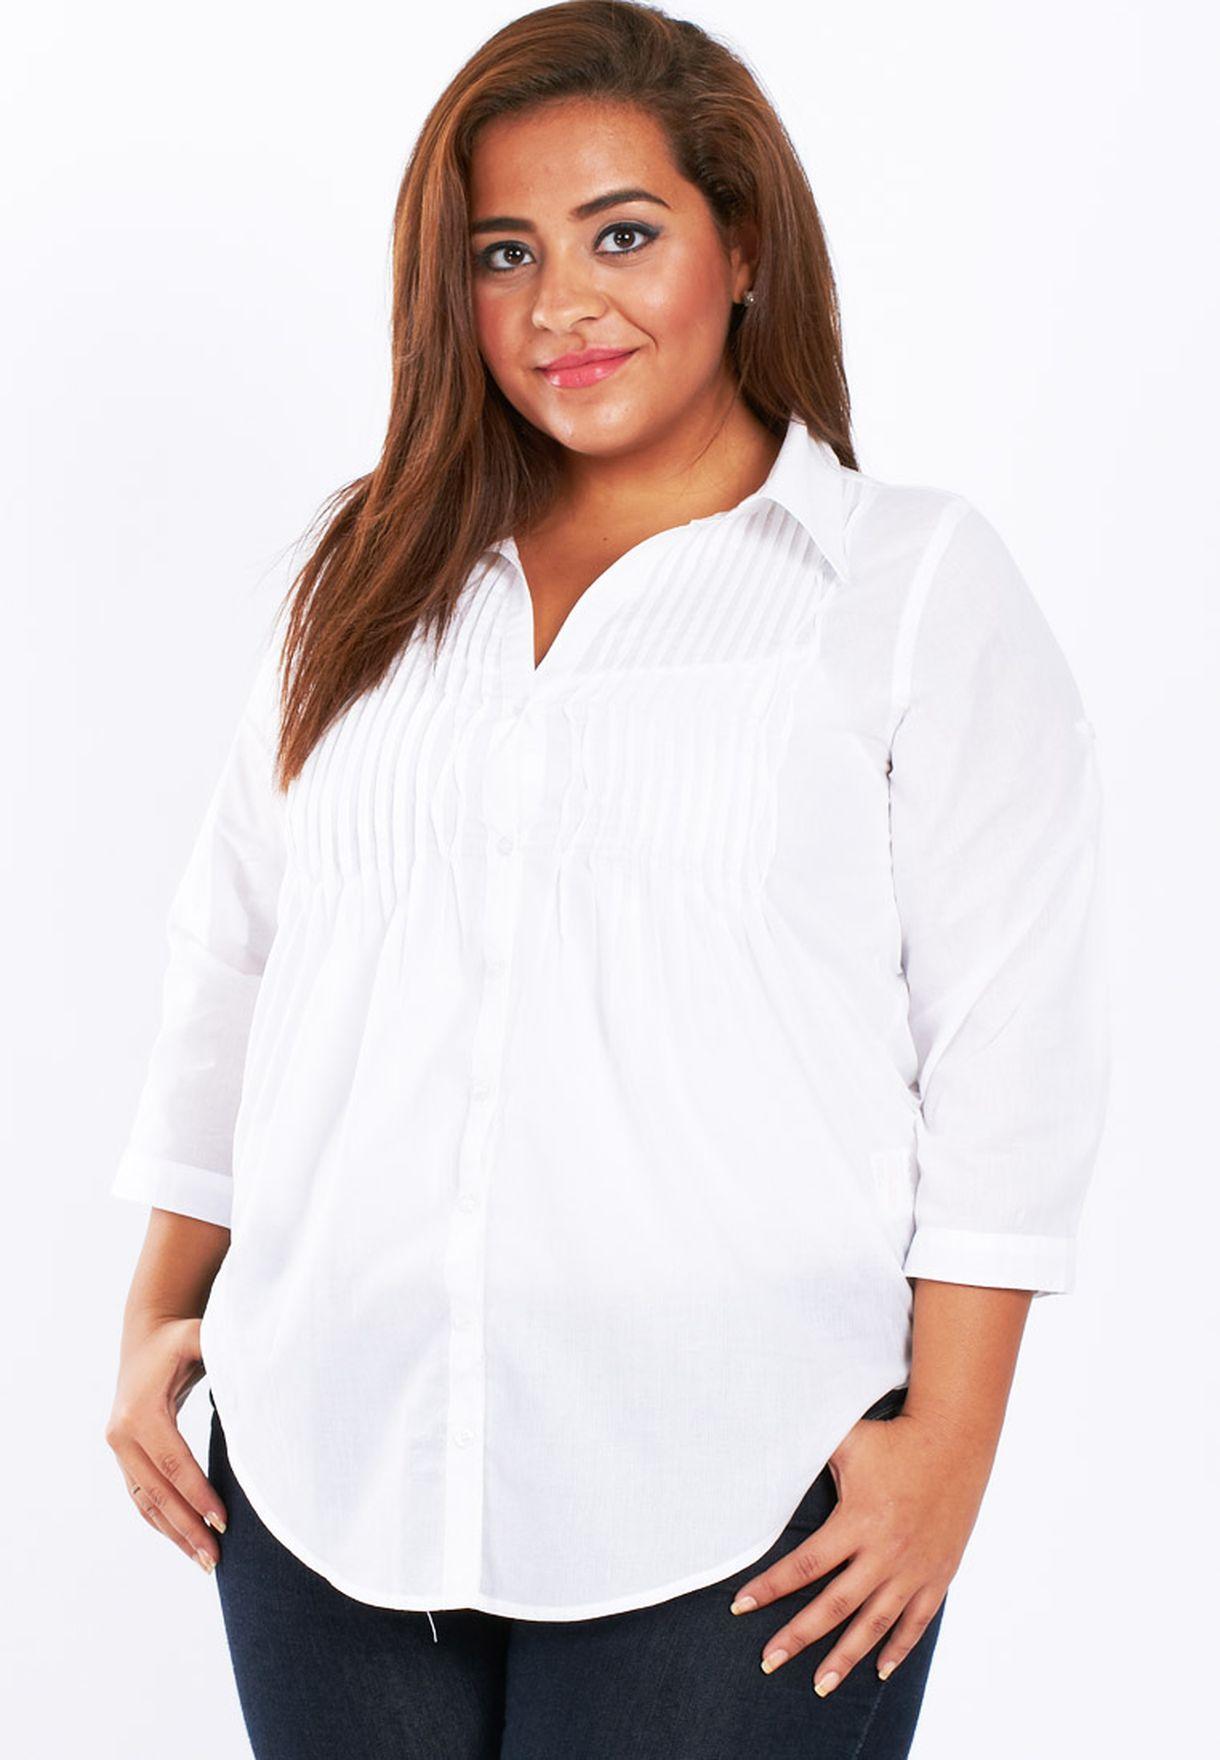 b5314a7d04b Shop Emoi En Plus white Plus Size Blouse for Women in Kuwait - VE172AT79DQY